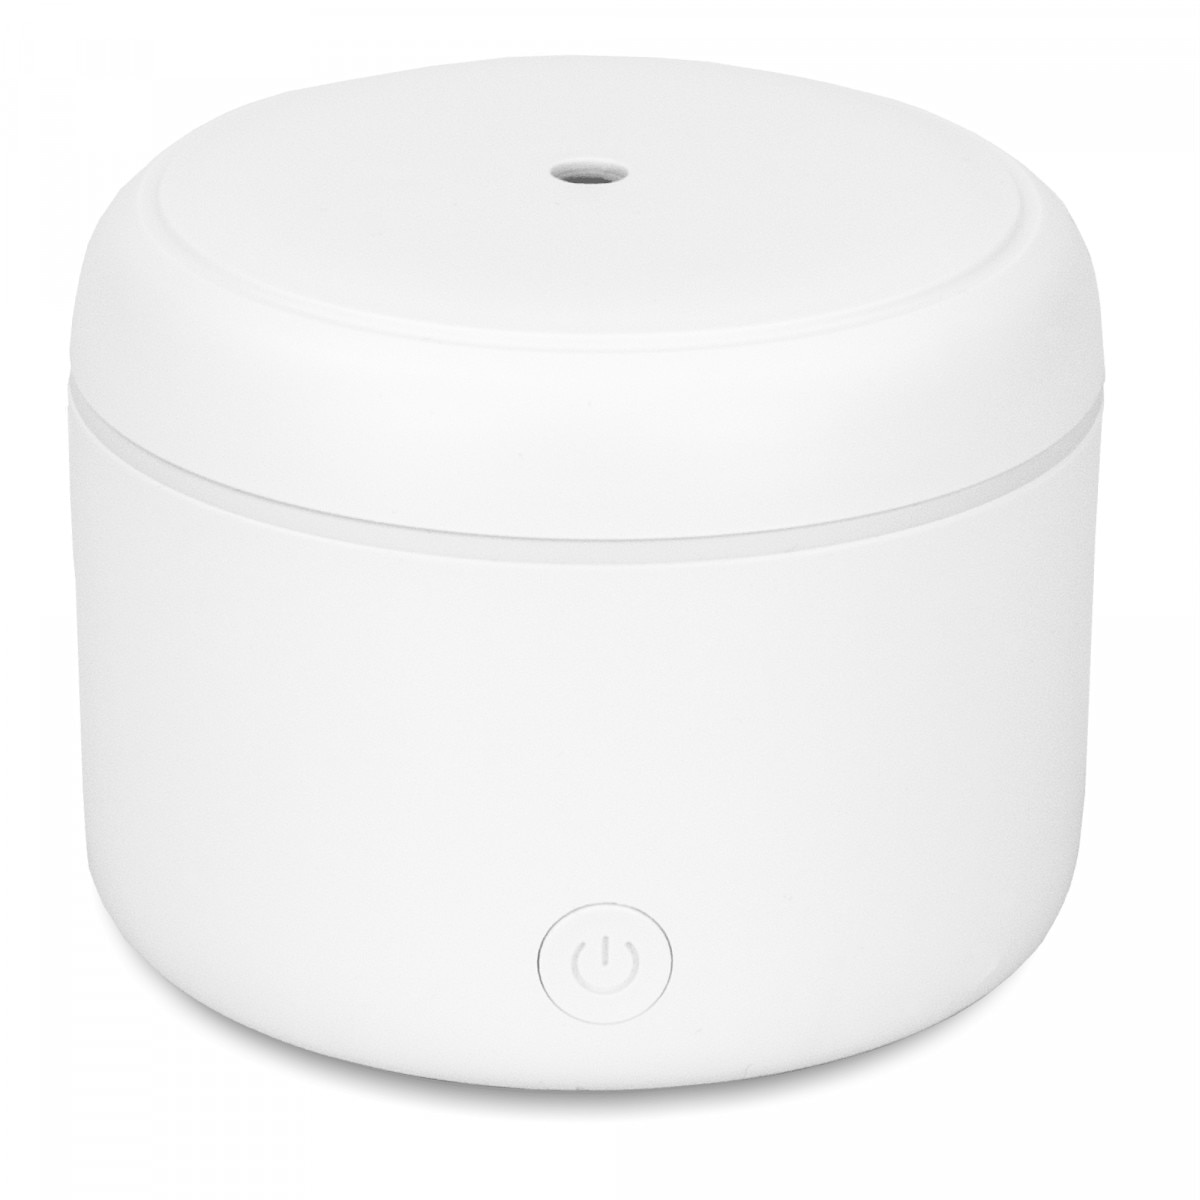 Fotografie Difuzor de Aroma cu Ultrasunete Turbionaire Puck Snow, 7 Lumini LED interschimbabile, 5 W, Silentios, Portabil, Posibilitate alimentare USB, Oprire automata